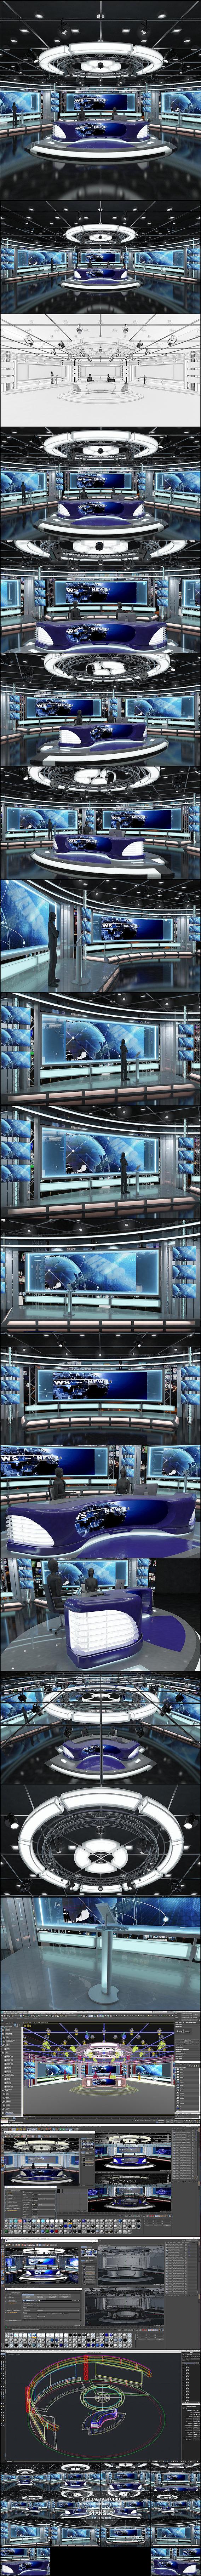 Virtual TV Studio News Set 1 - 3D Model Designs